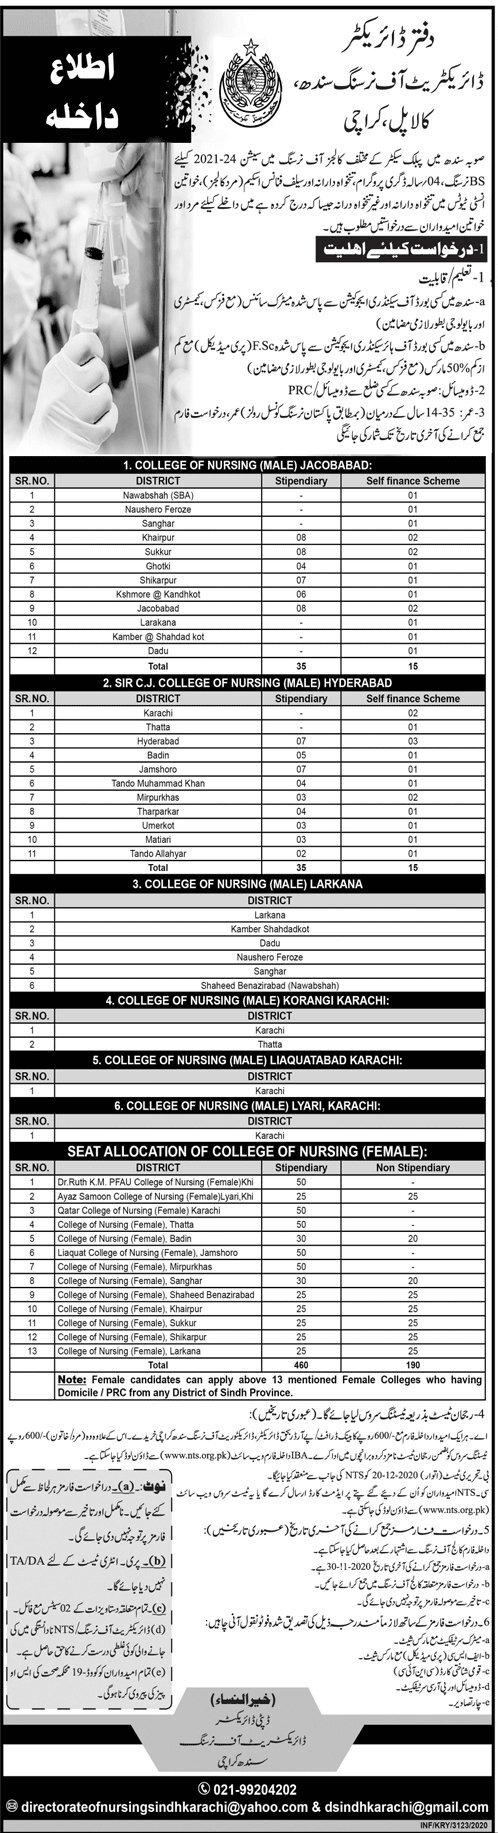 Directorate of Nursing Sindh Karachi BS Nursing Program NTS Roll No Slip